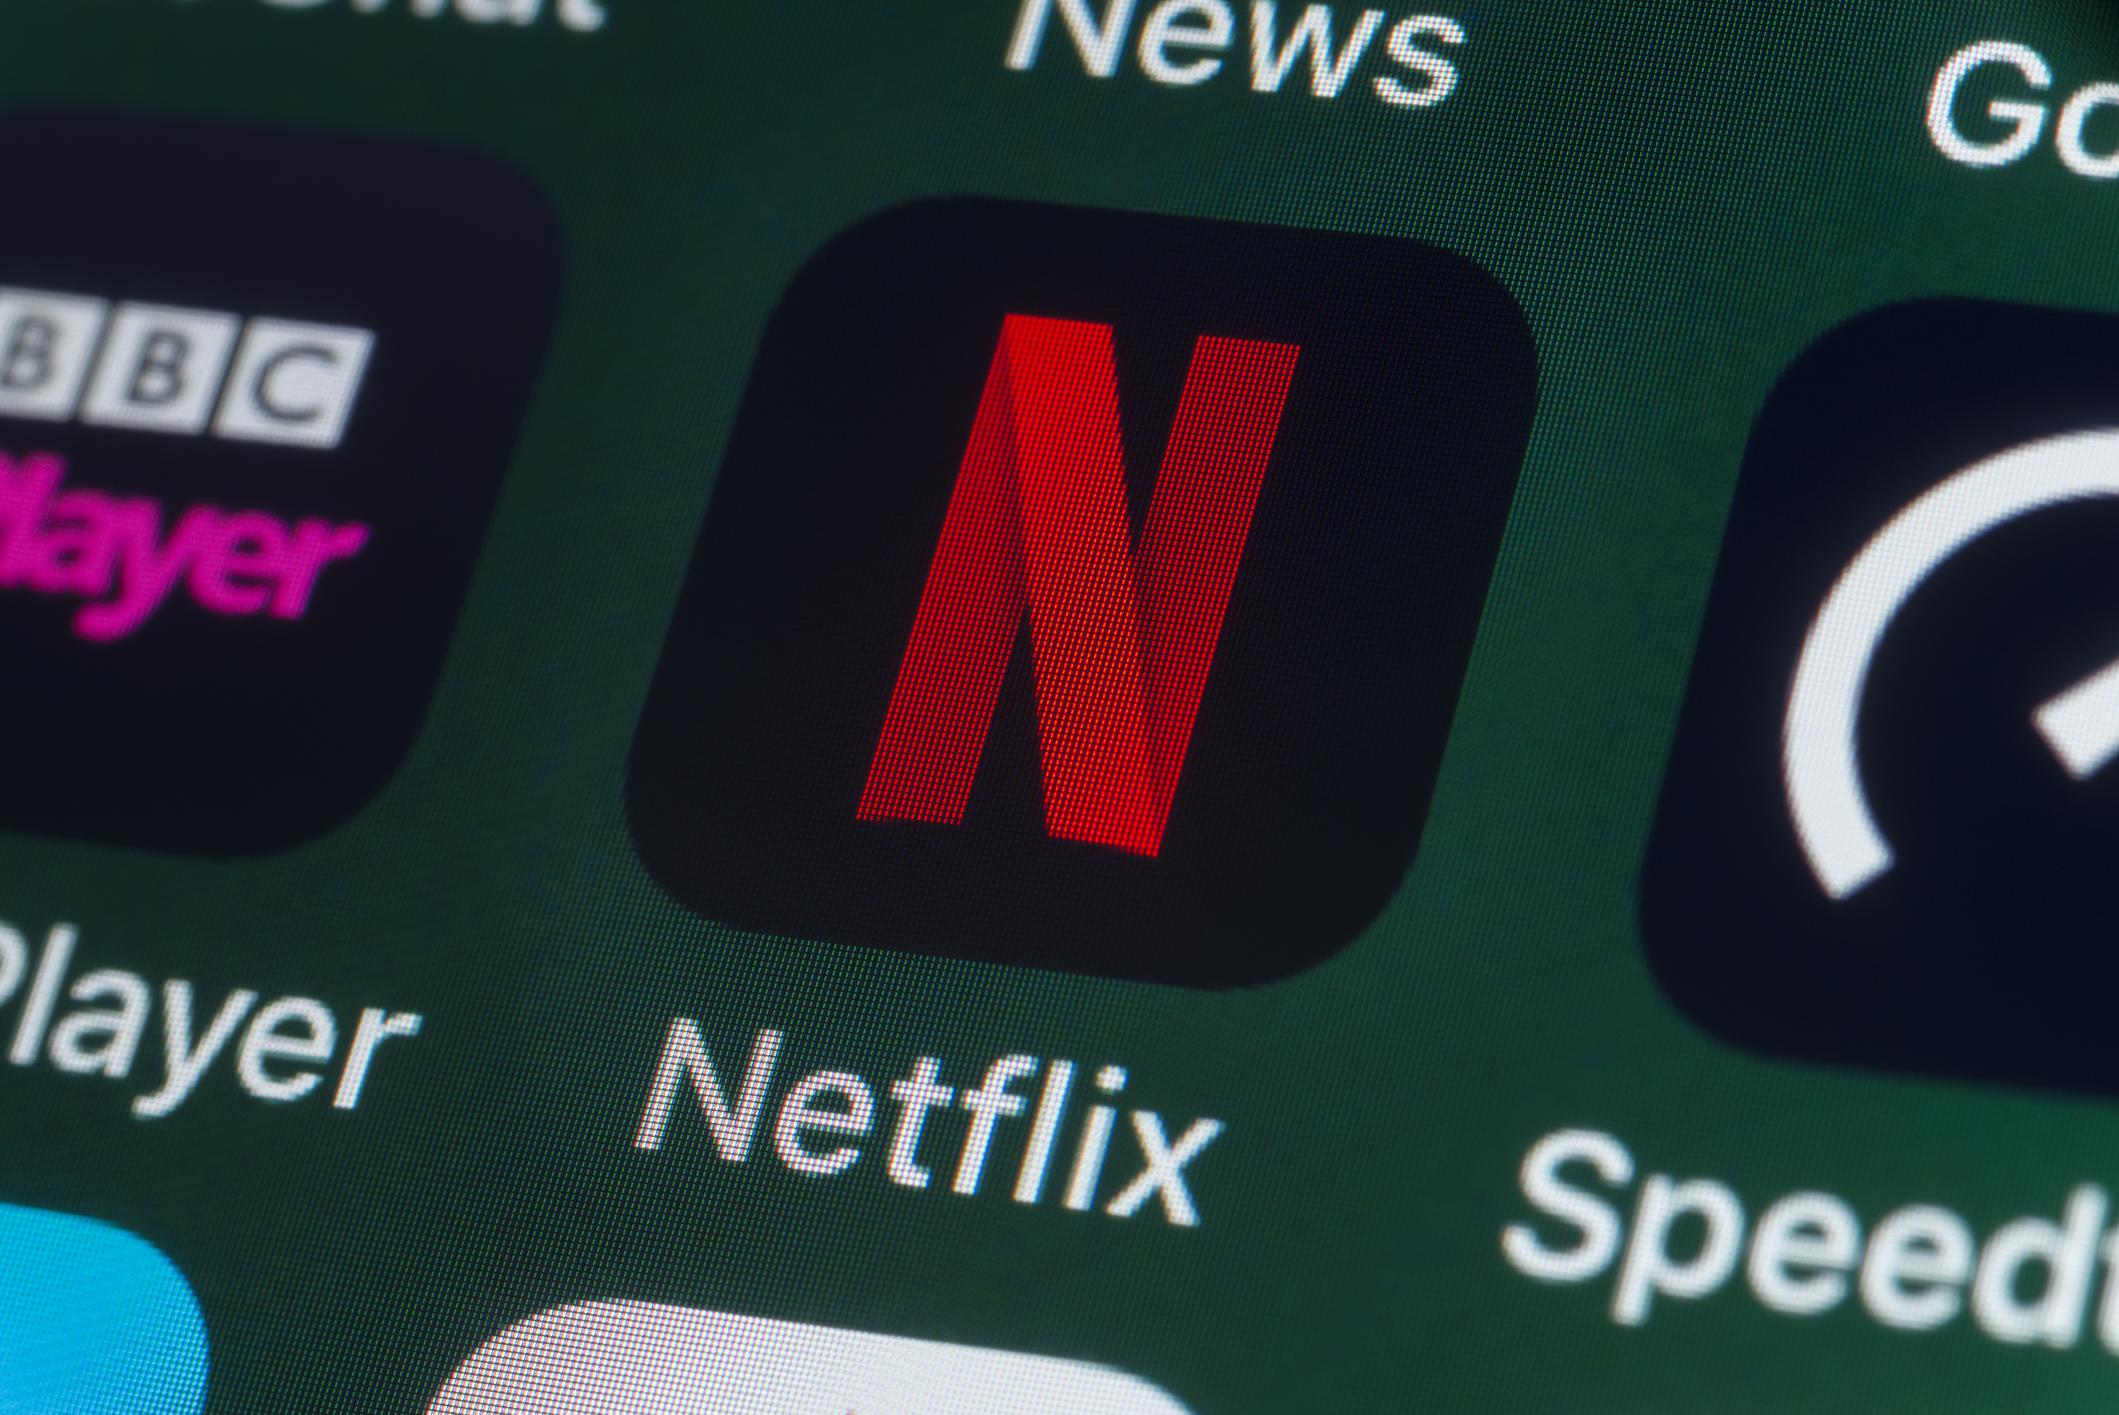 The Netflix icon